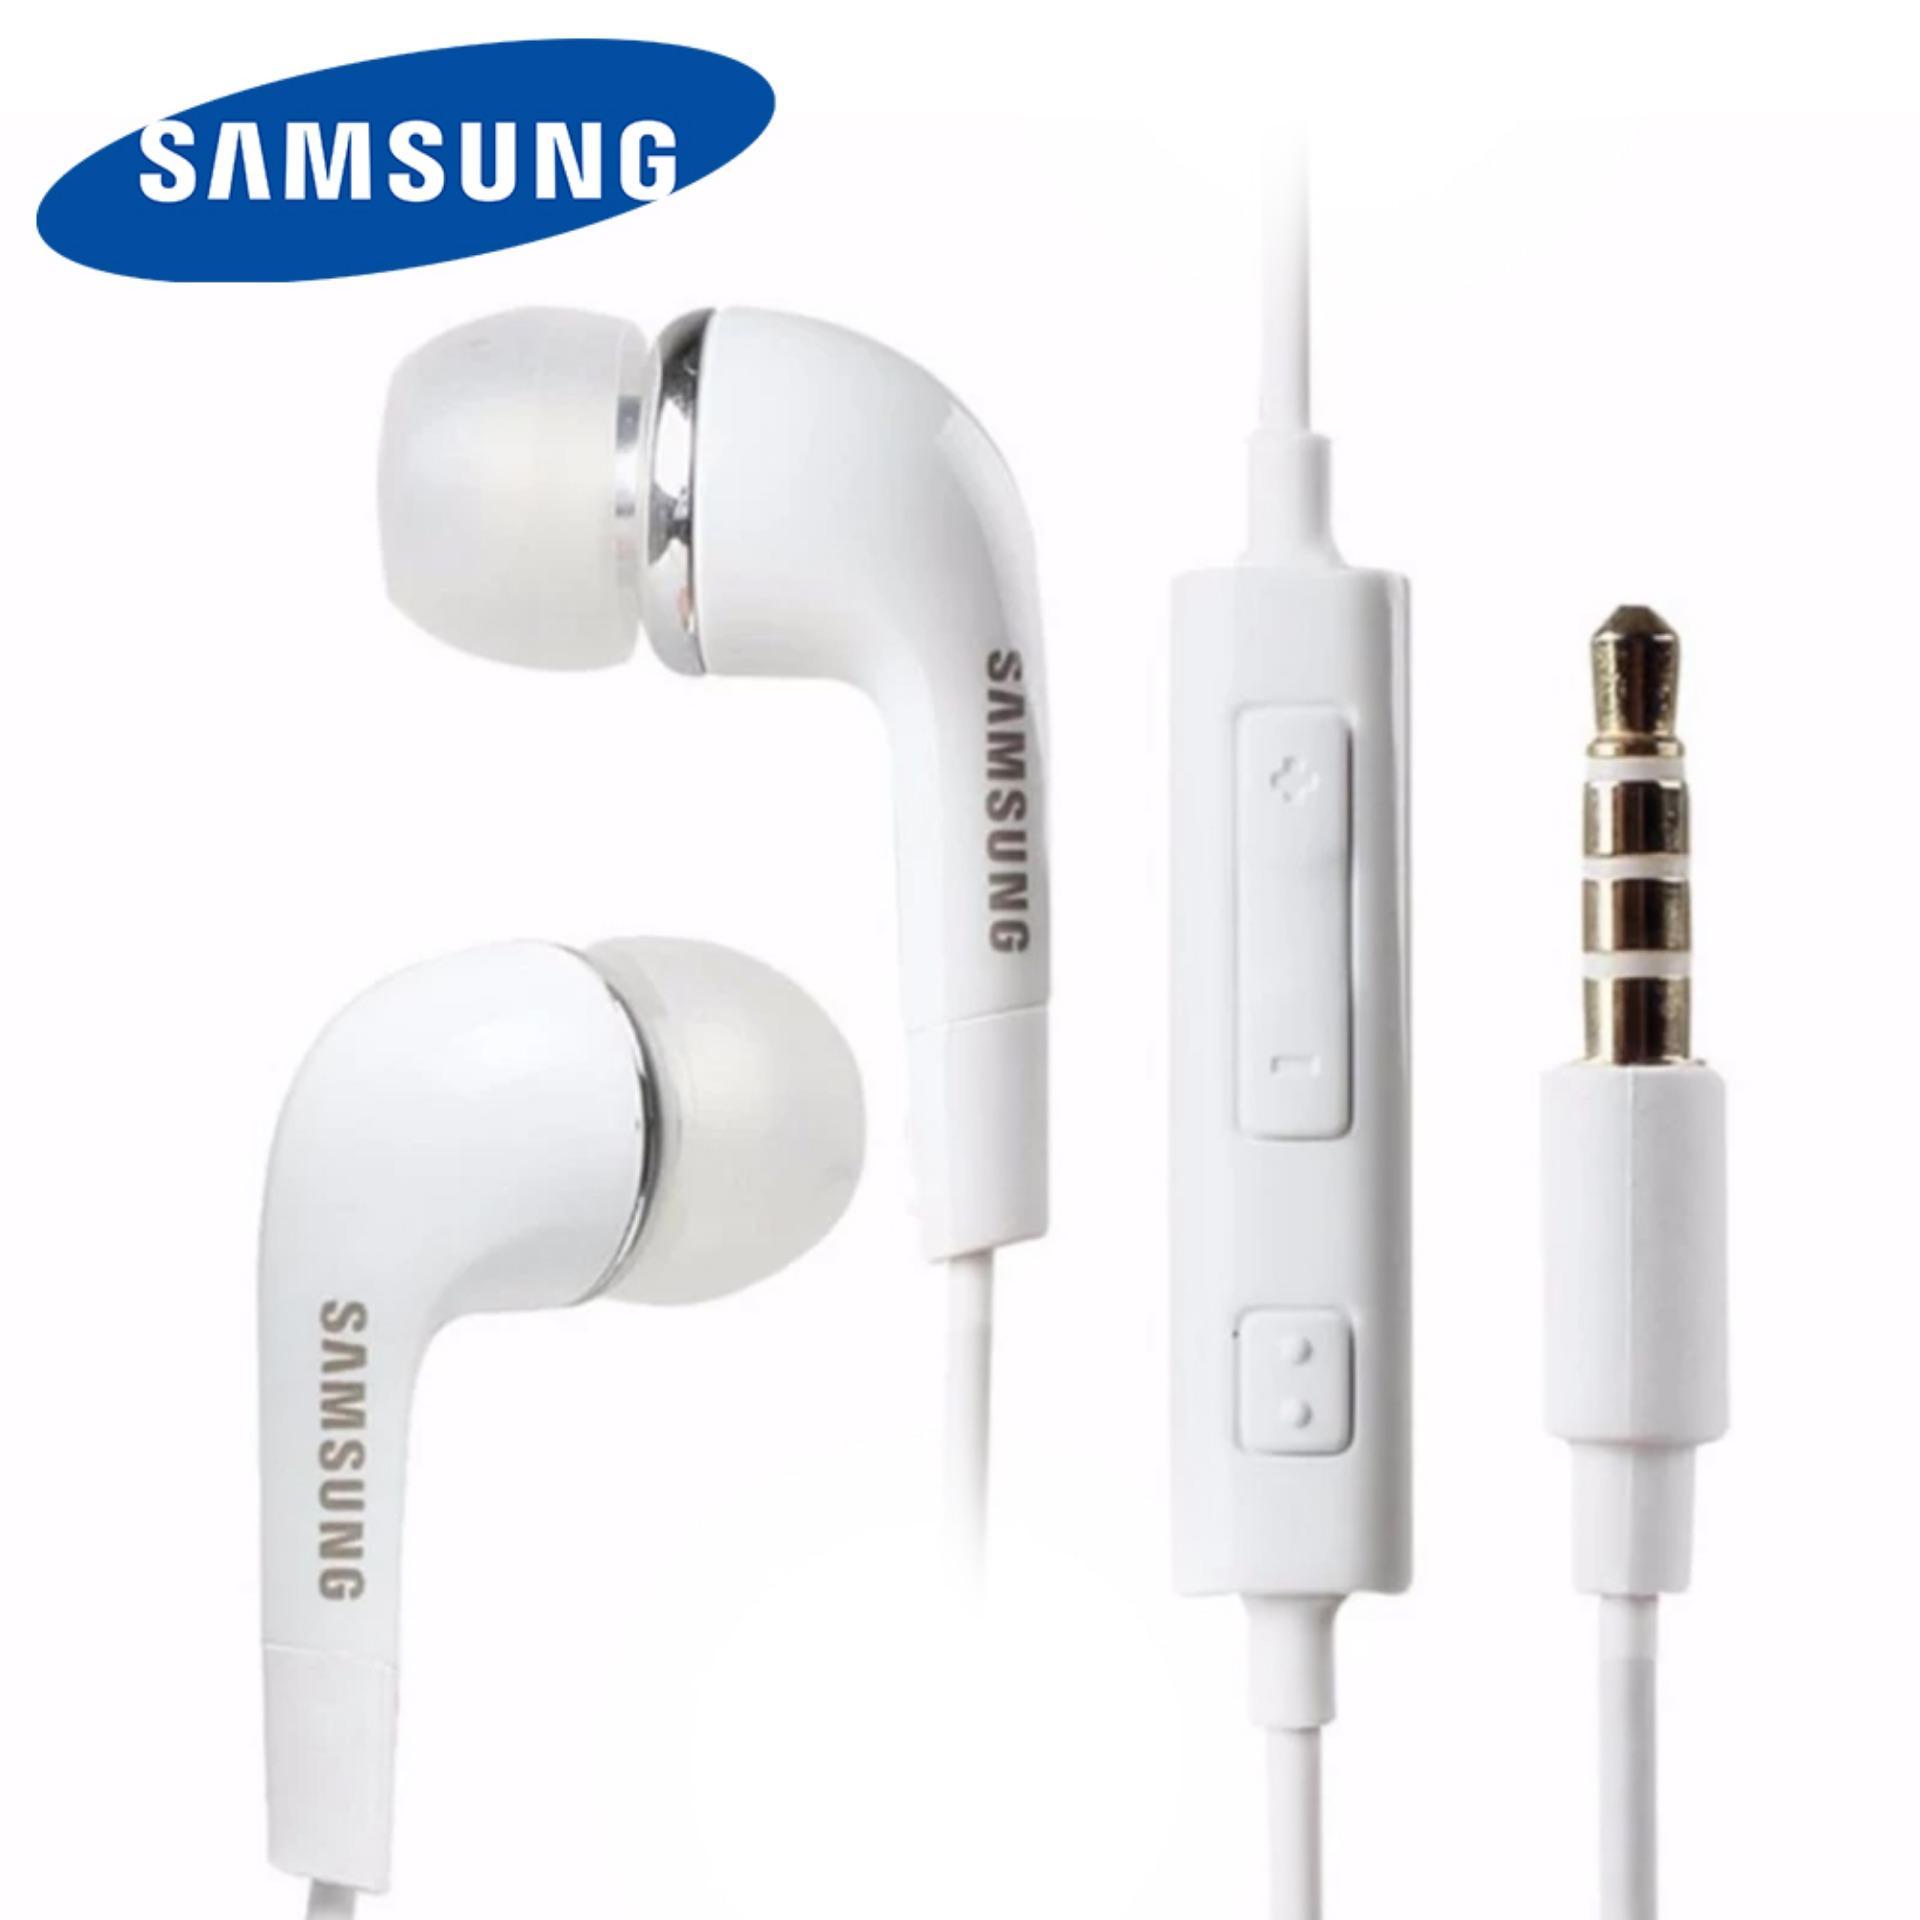 Headset Samsung Galaxy J1 Ace Stereo Headset Flat Cable High Quality 3.5mm Jack Audio - Putih